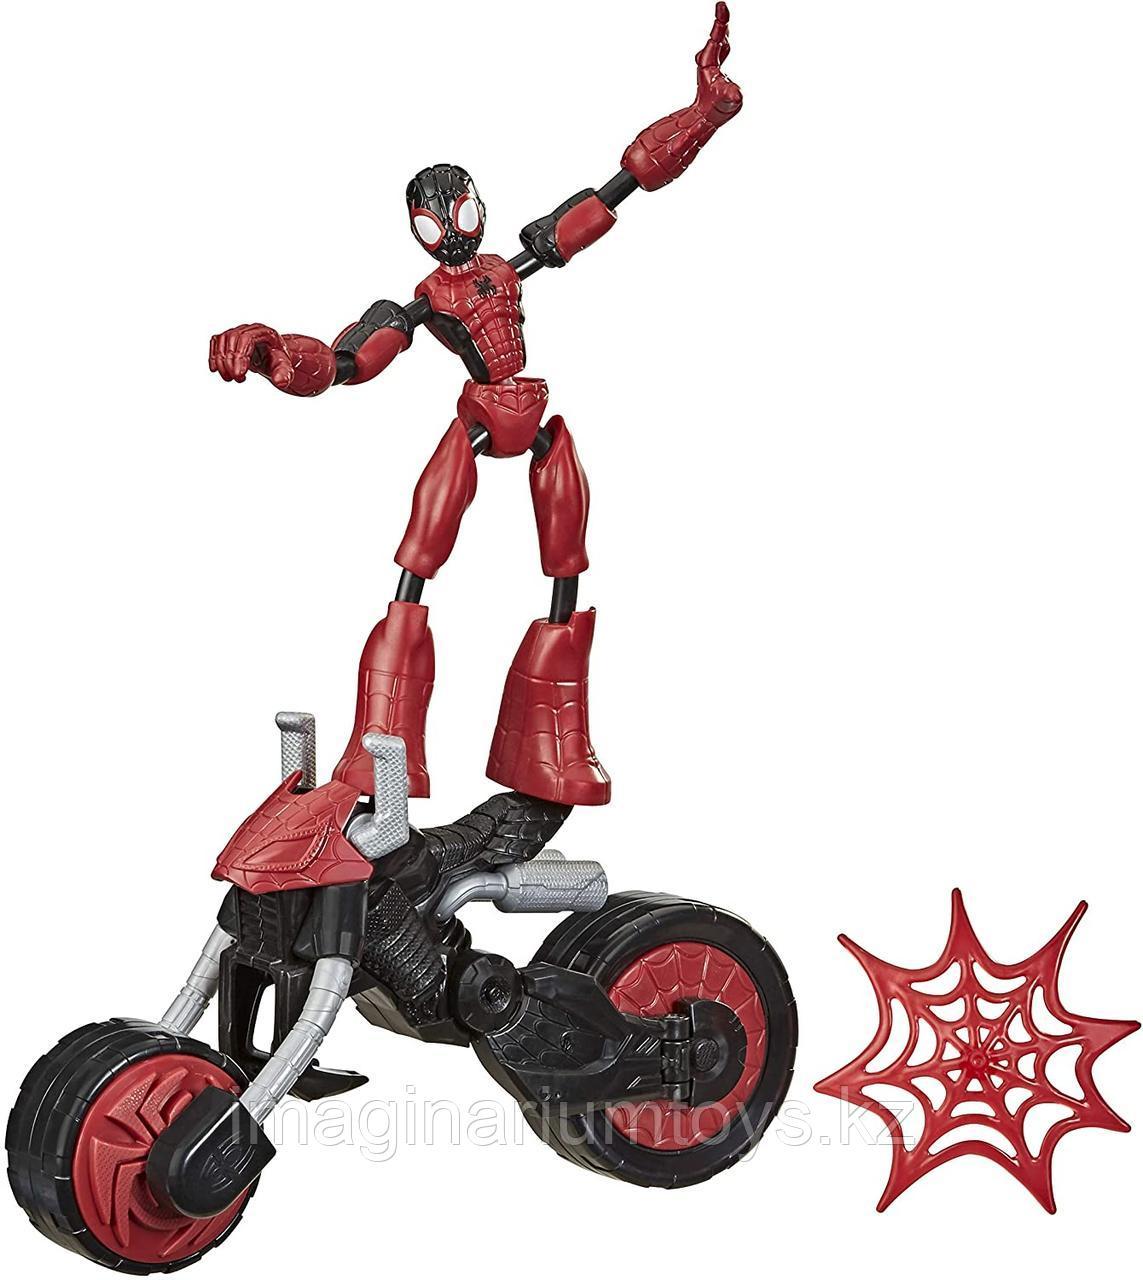 Человек-паук на мотоцикле Bend&Flex Spider-man